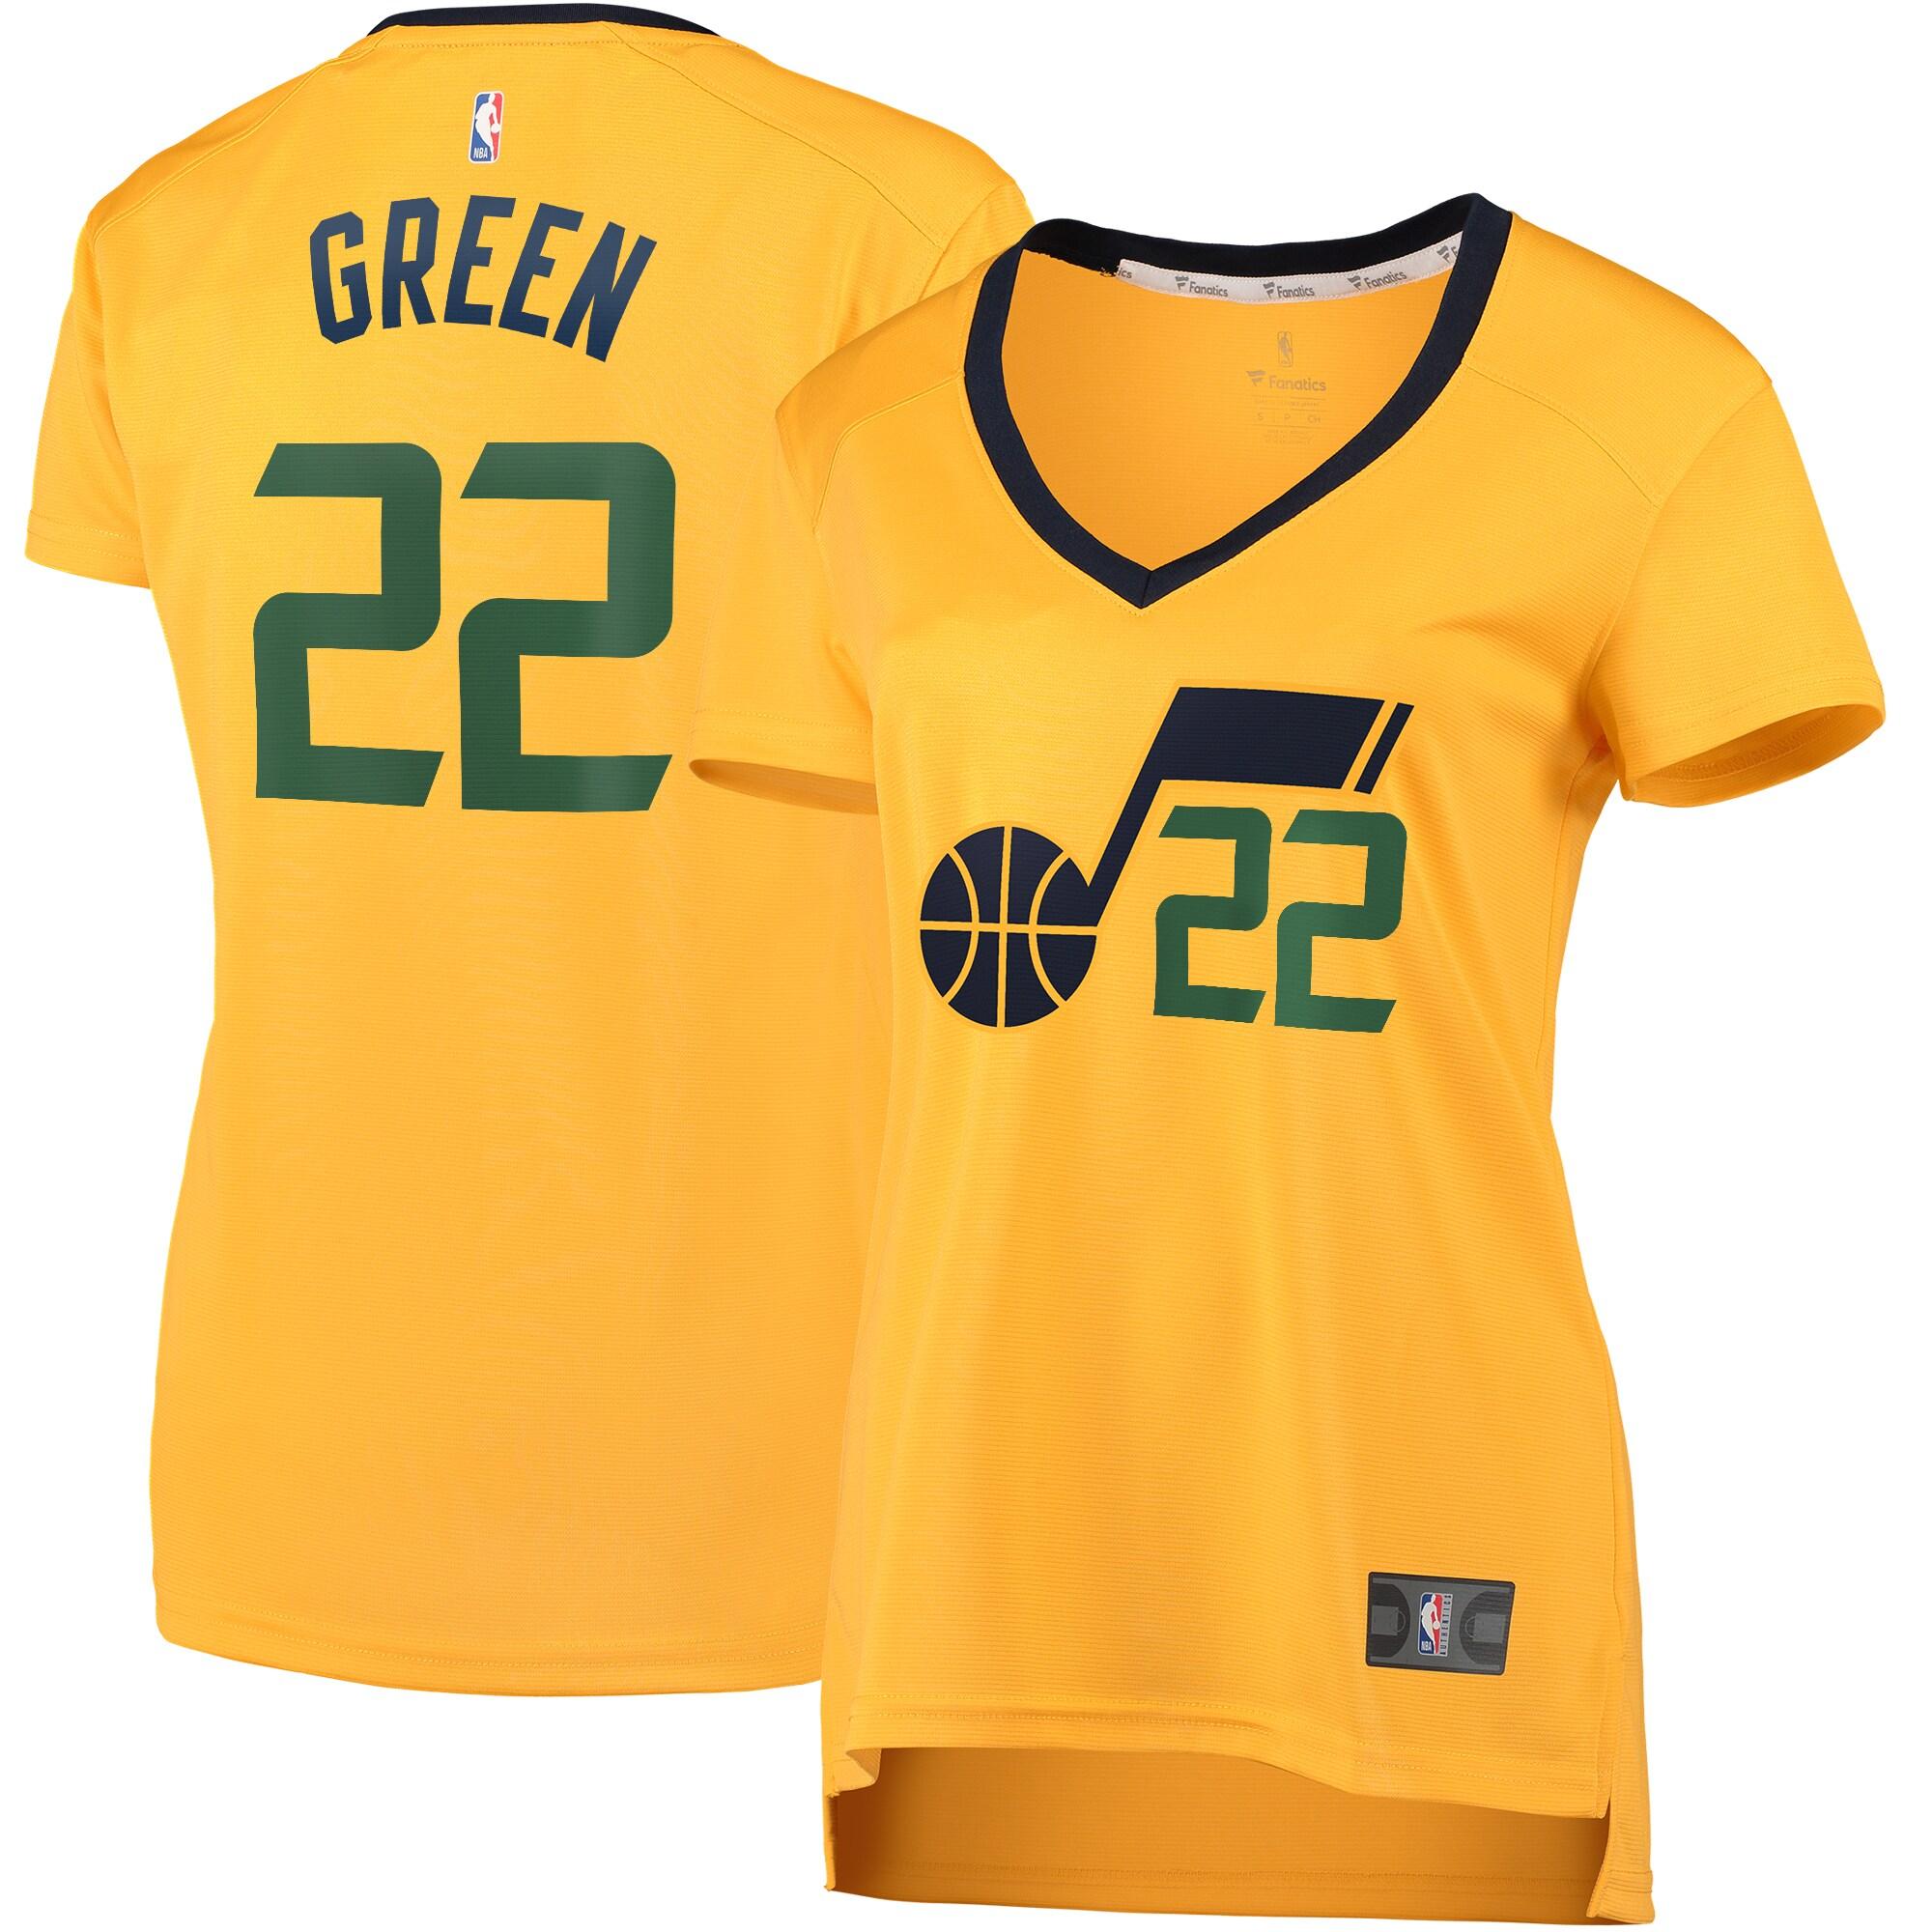 Jeff Green Utah Jazz Fanatics Branded Women's Fast Break Player Jersey - Statement Edition - Gold